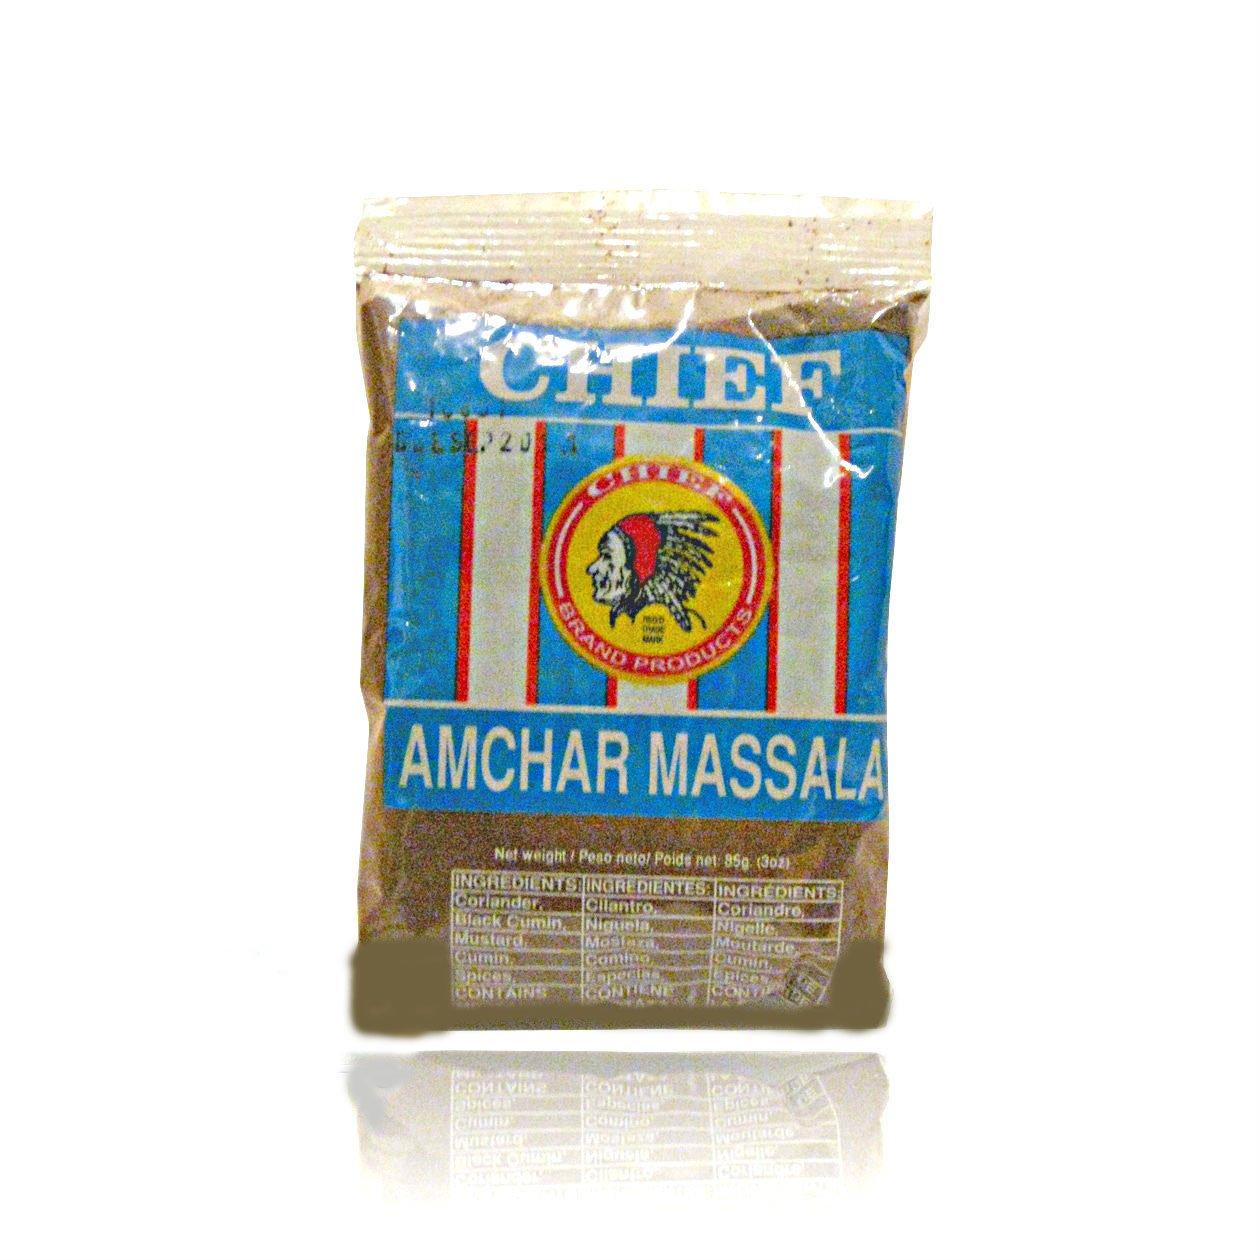 Chief Amchar Massala 3oz (Single Bag) Product of Trinidad & Tobago